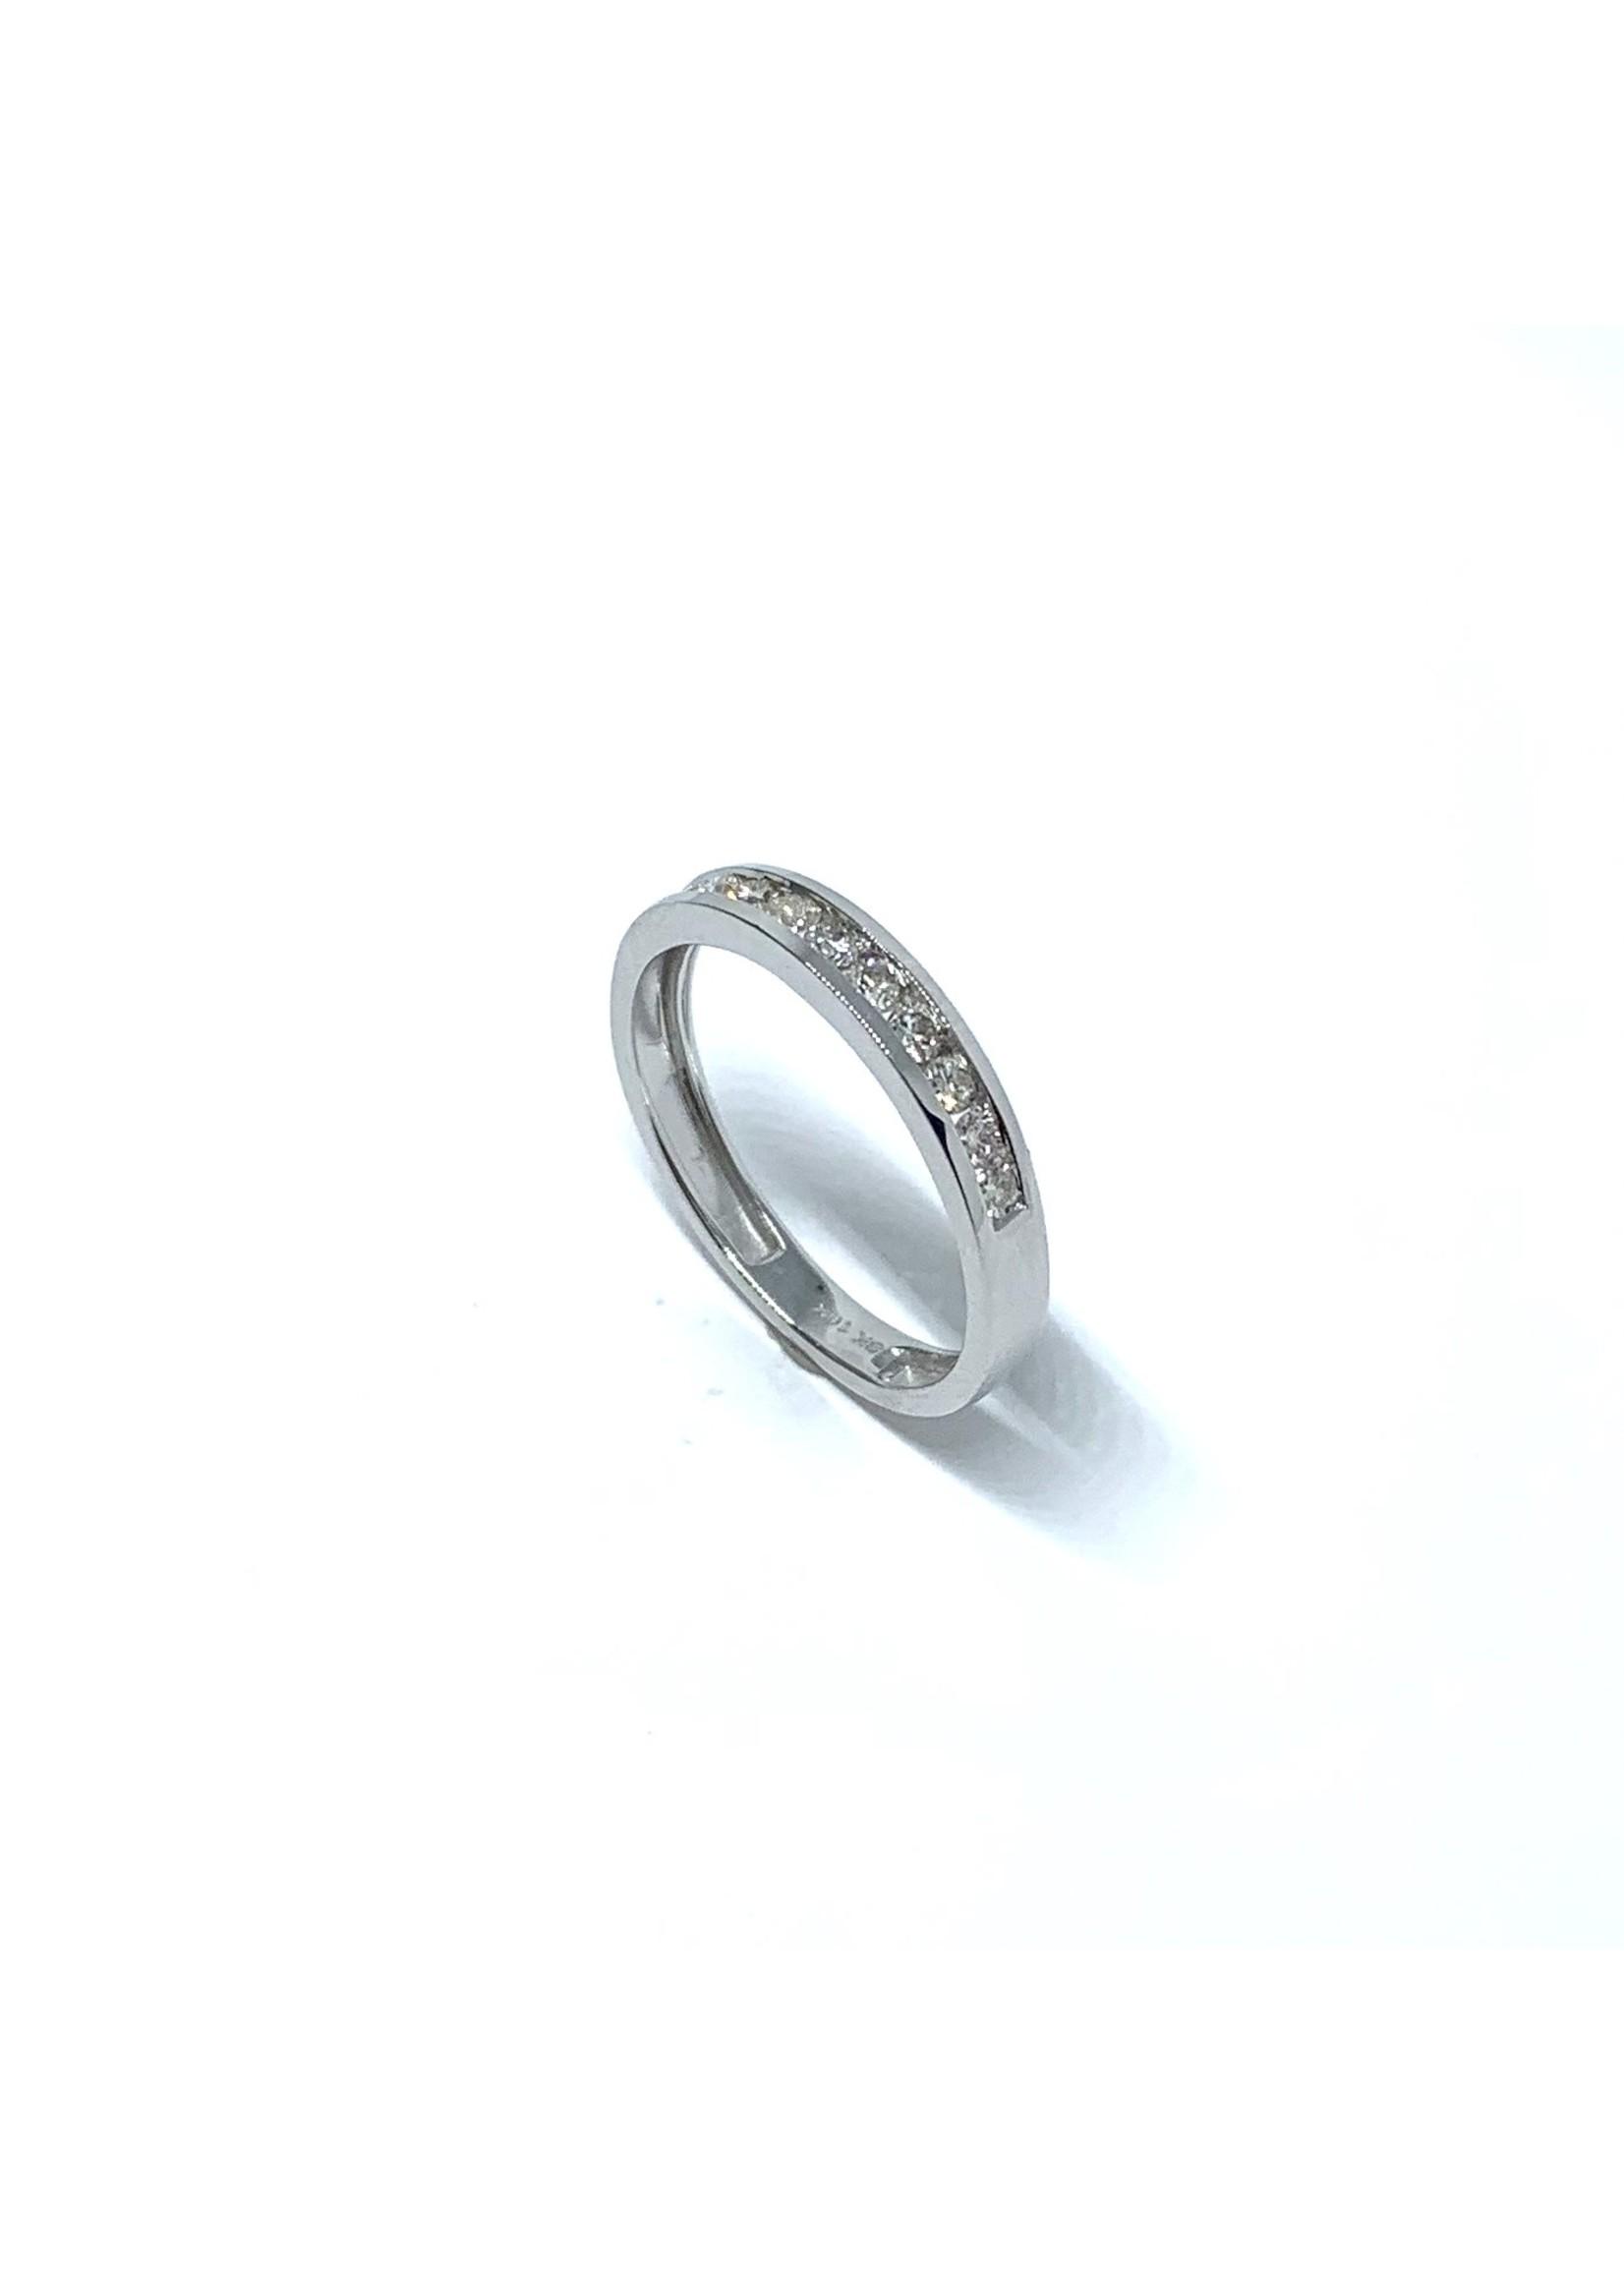 Jonc Semi-éternité Or blanc 10K avec Diamants